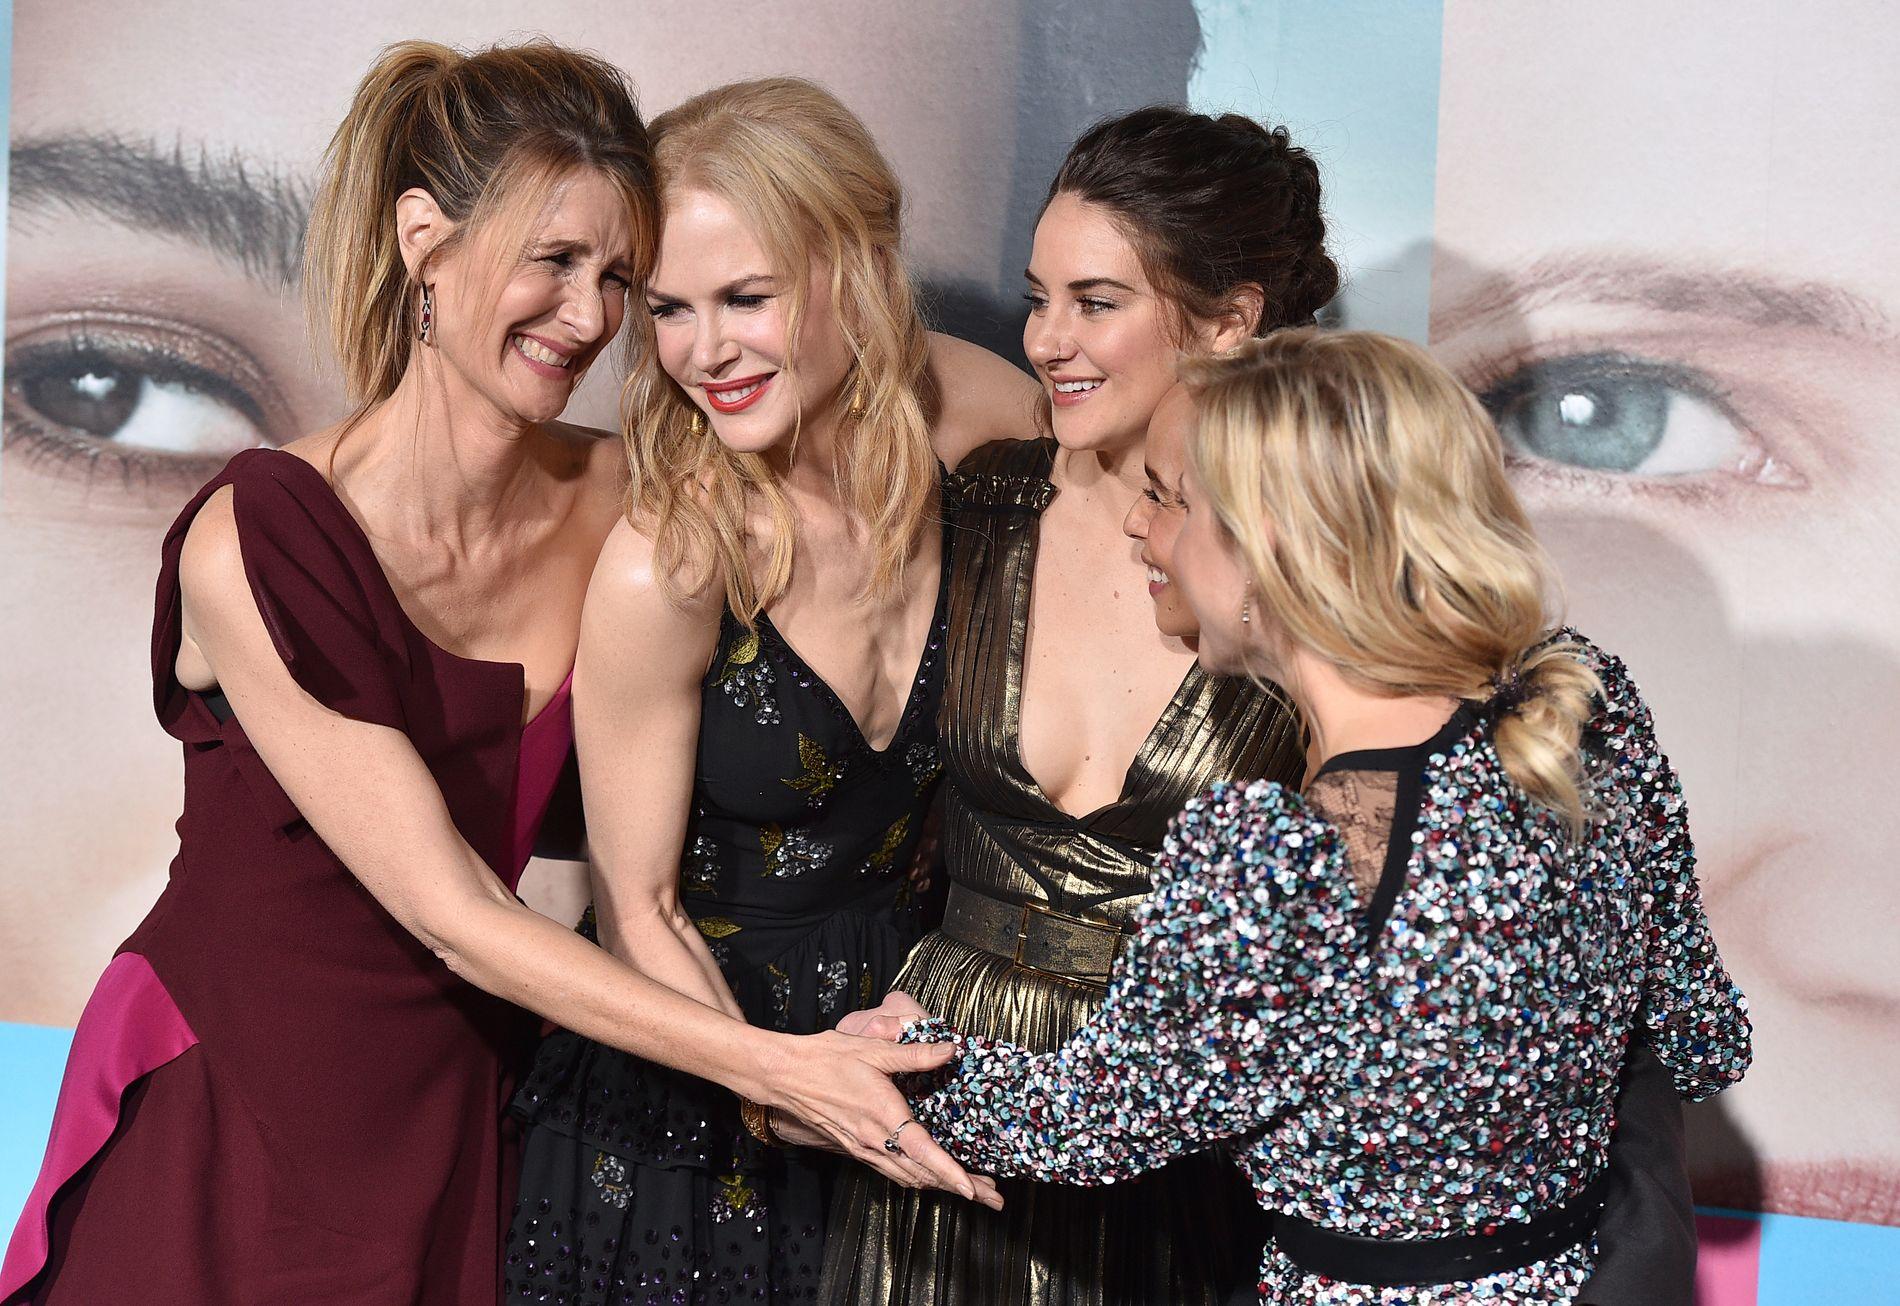 STJERNELAG: Lauren Dern, Nicole Kidman, Shailene Woodley, Zoe Kravitz og Reese Witherspoon spiller i den kritikerroste serien.